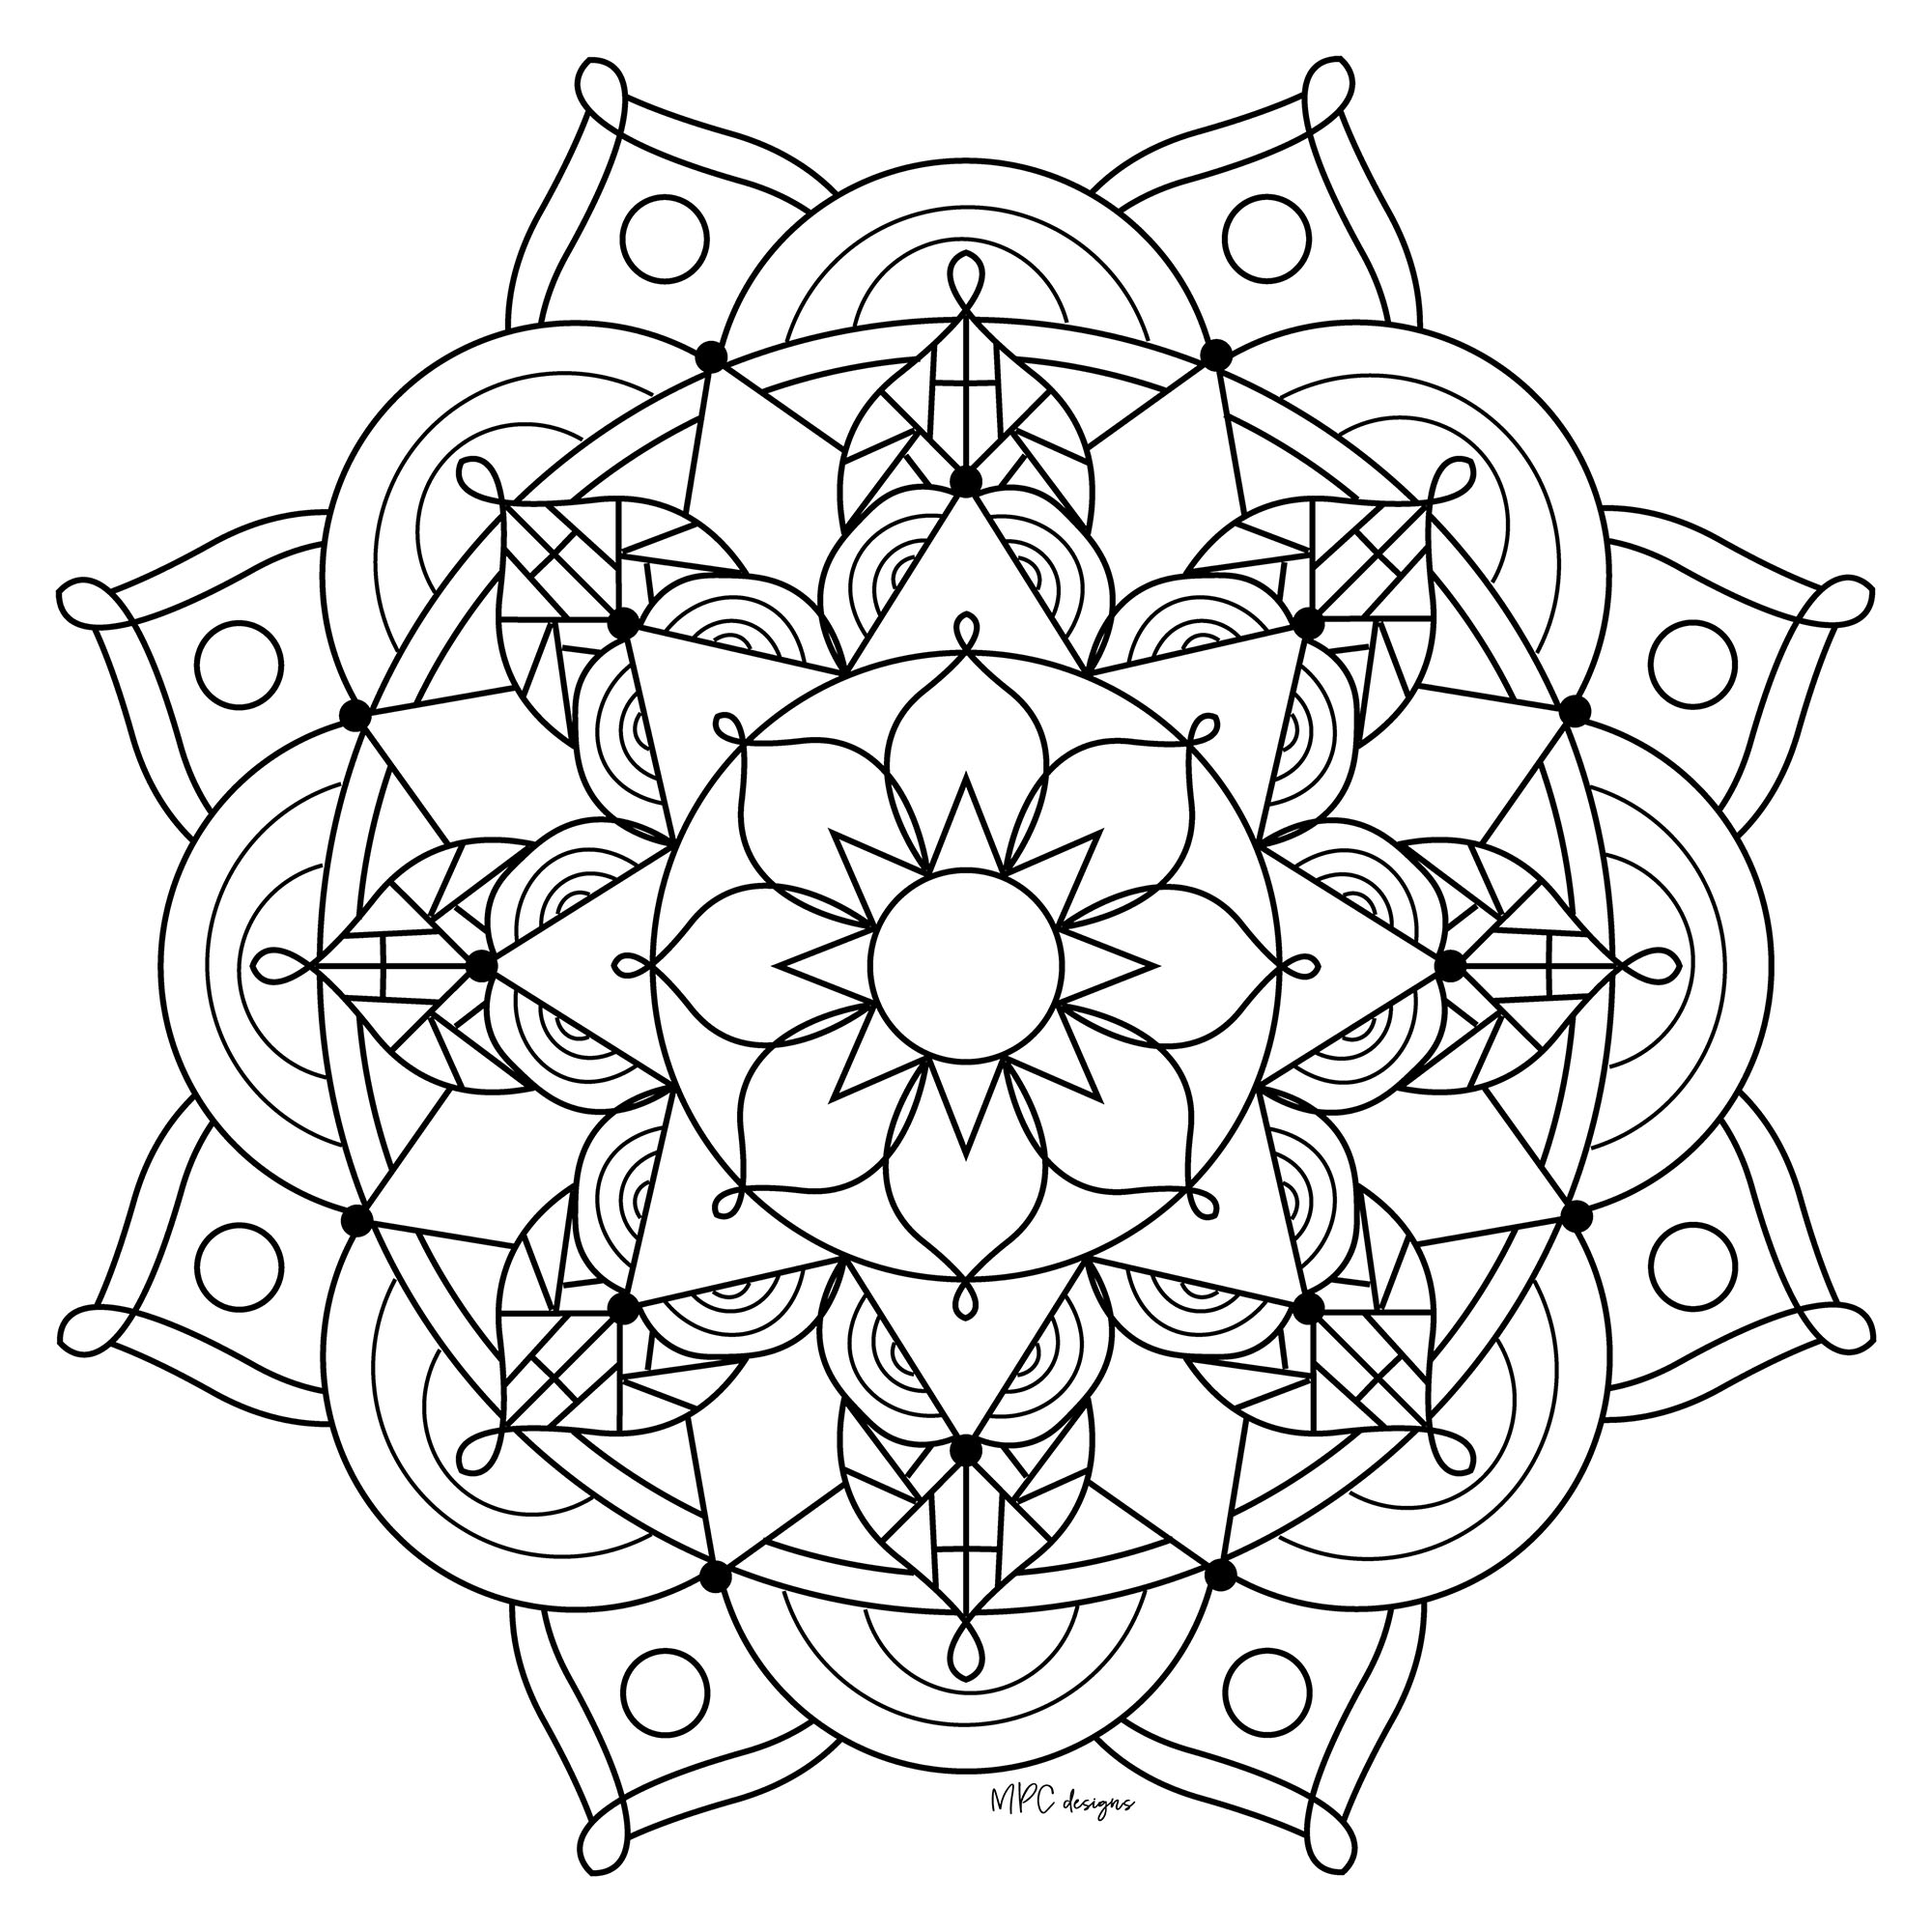 Mandala gratuit mpc design 9 coloriage mandalas - Coloriage mandala enfants ...